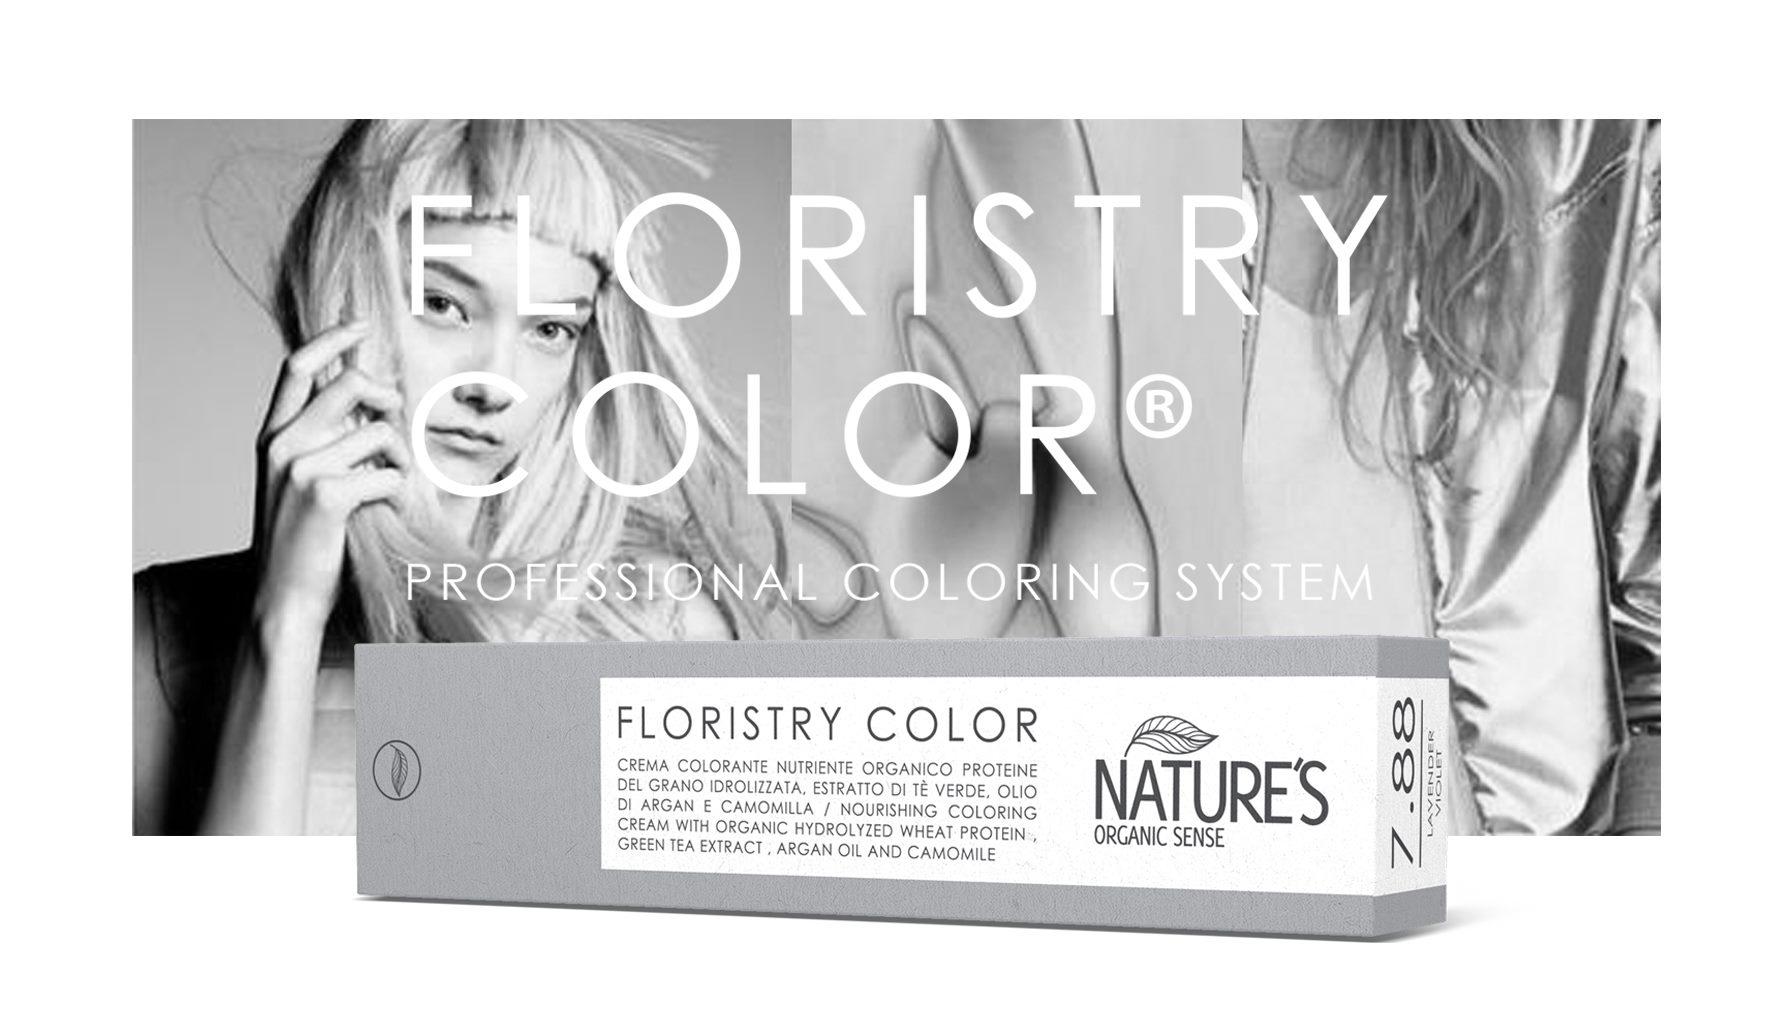 Nature's-Organic-Sense-floristy-color.jpg